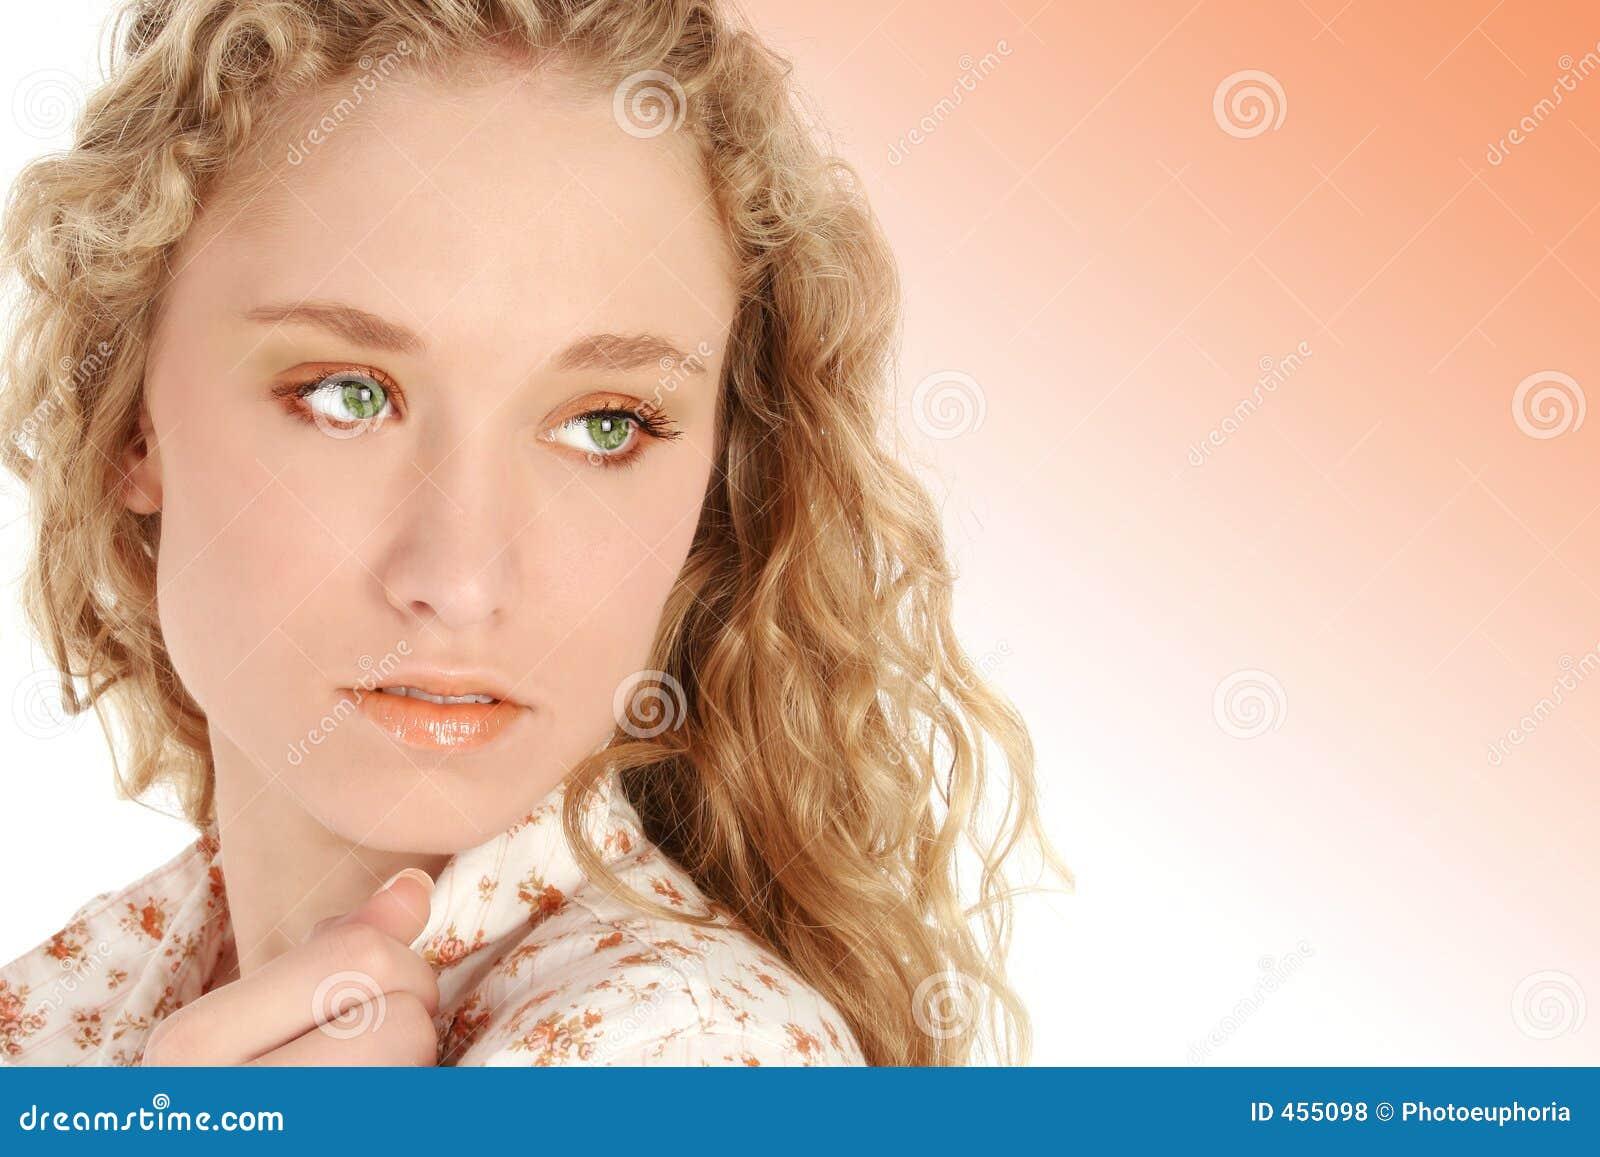 rubio ojos verdes